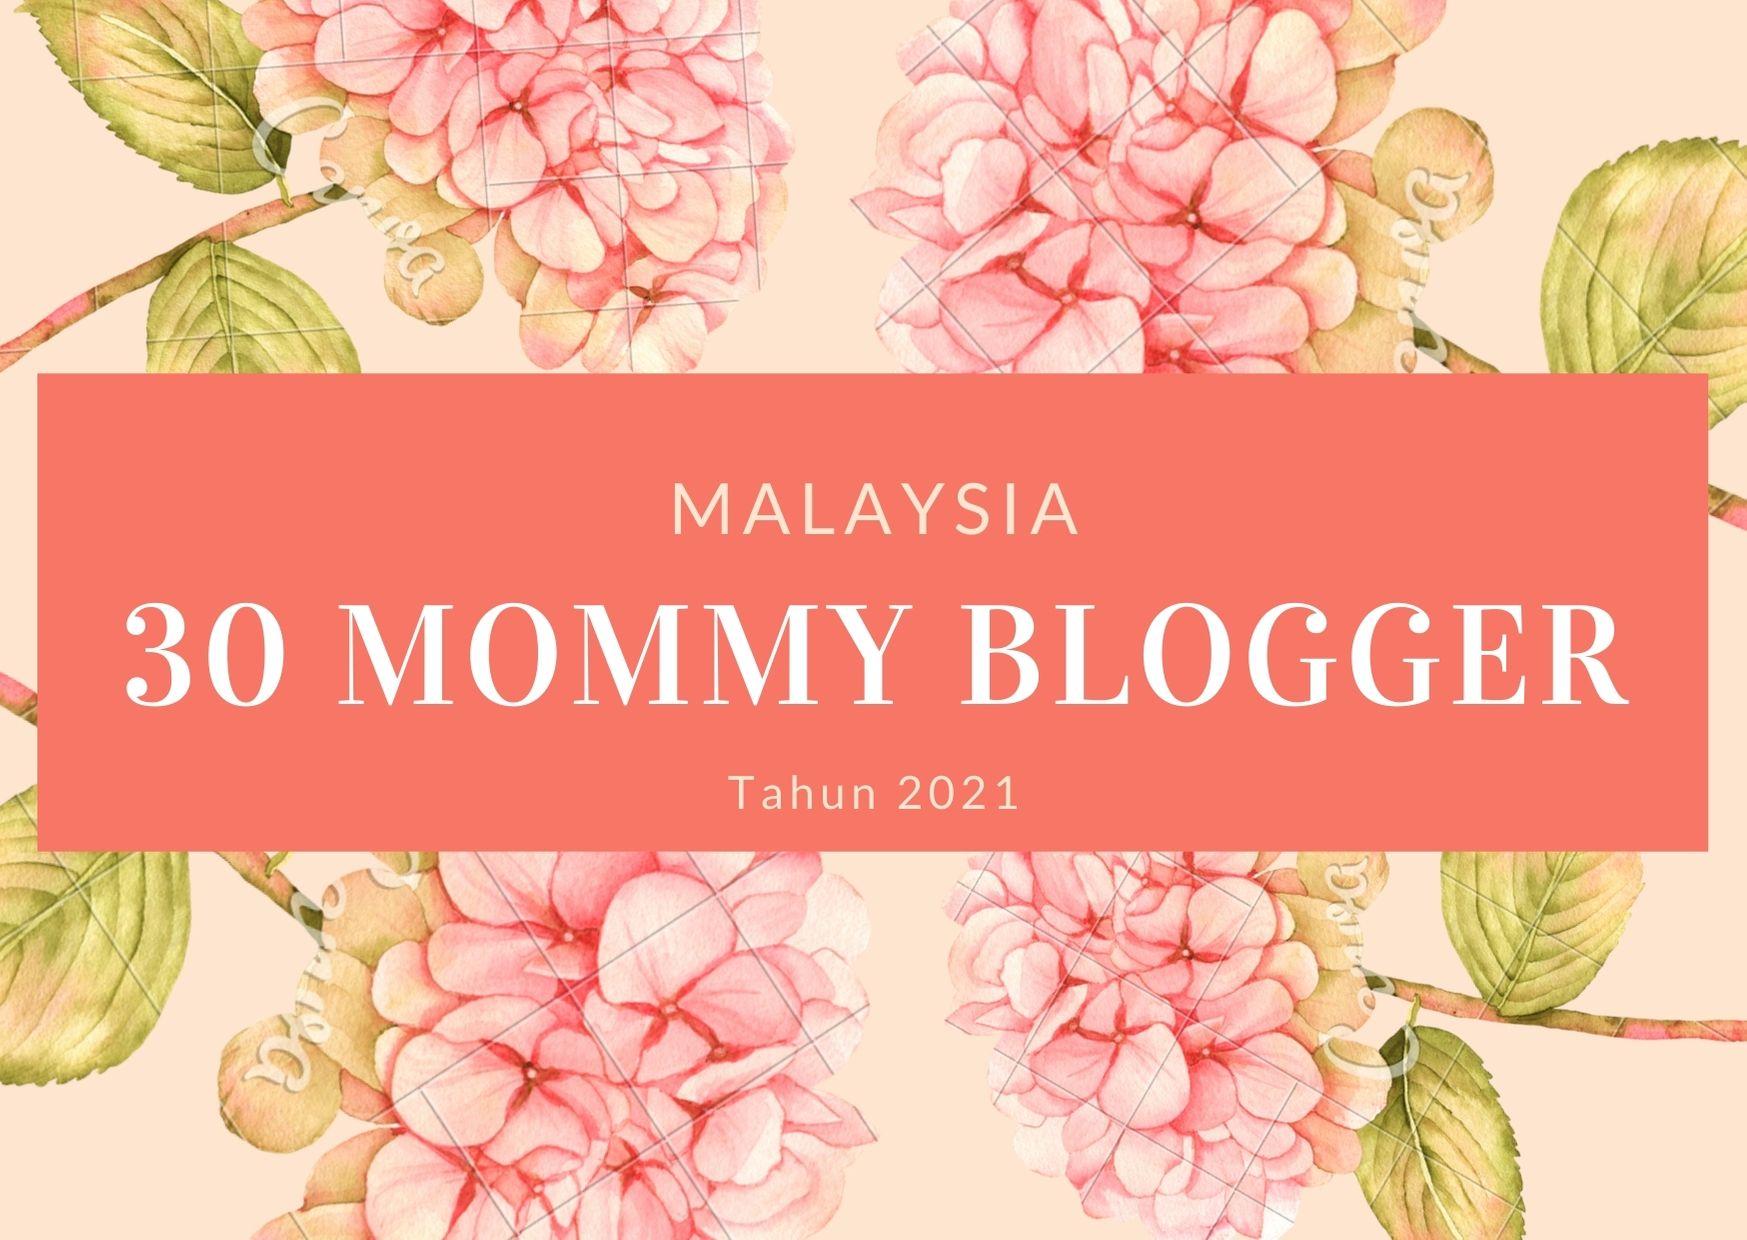 malay kol malay parenting mommy blog malaysia